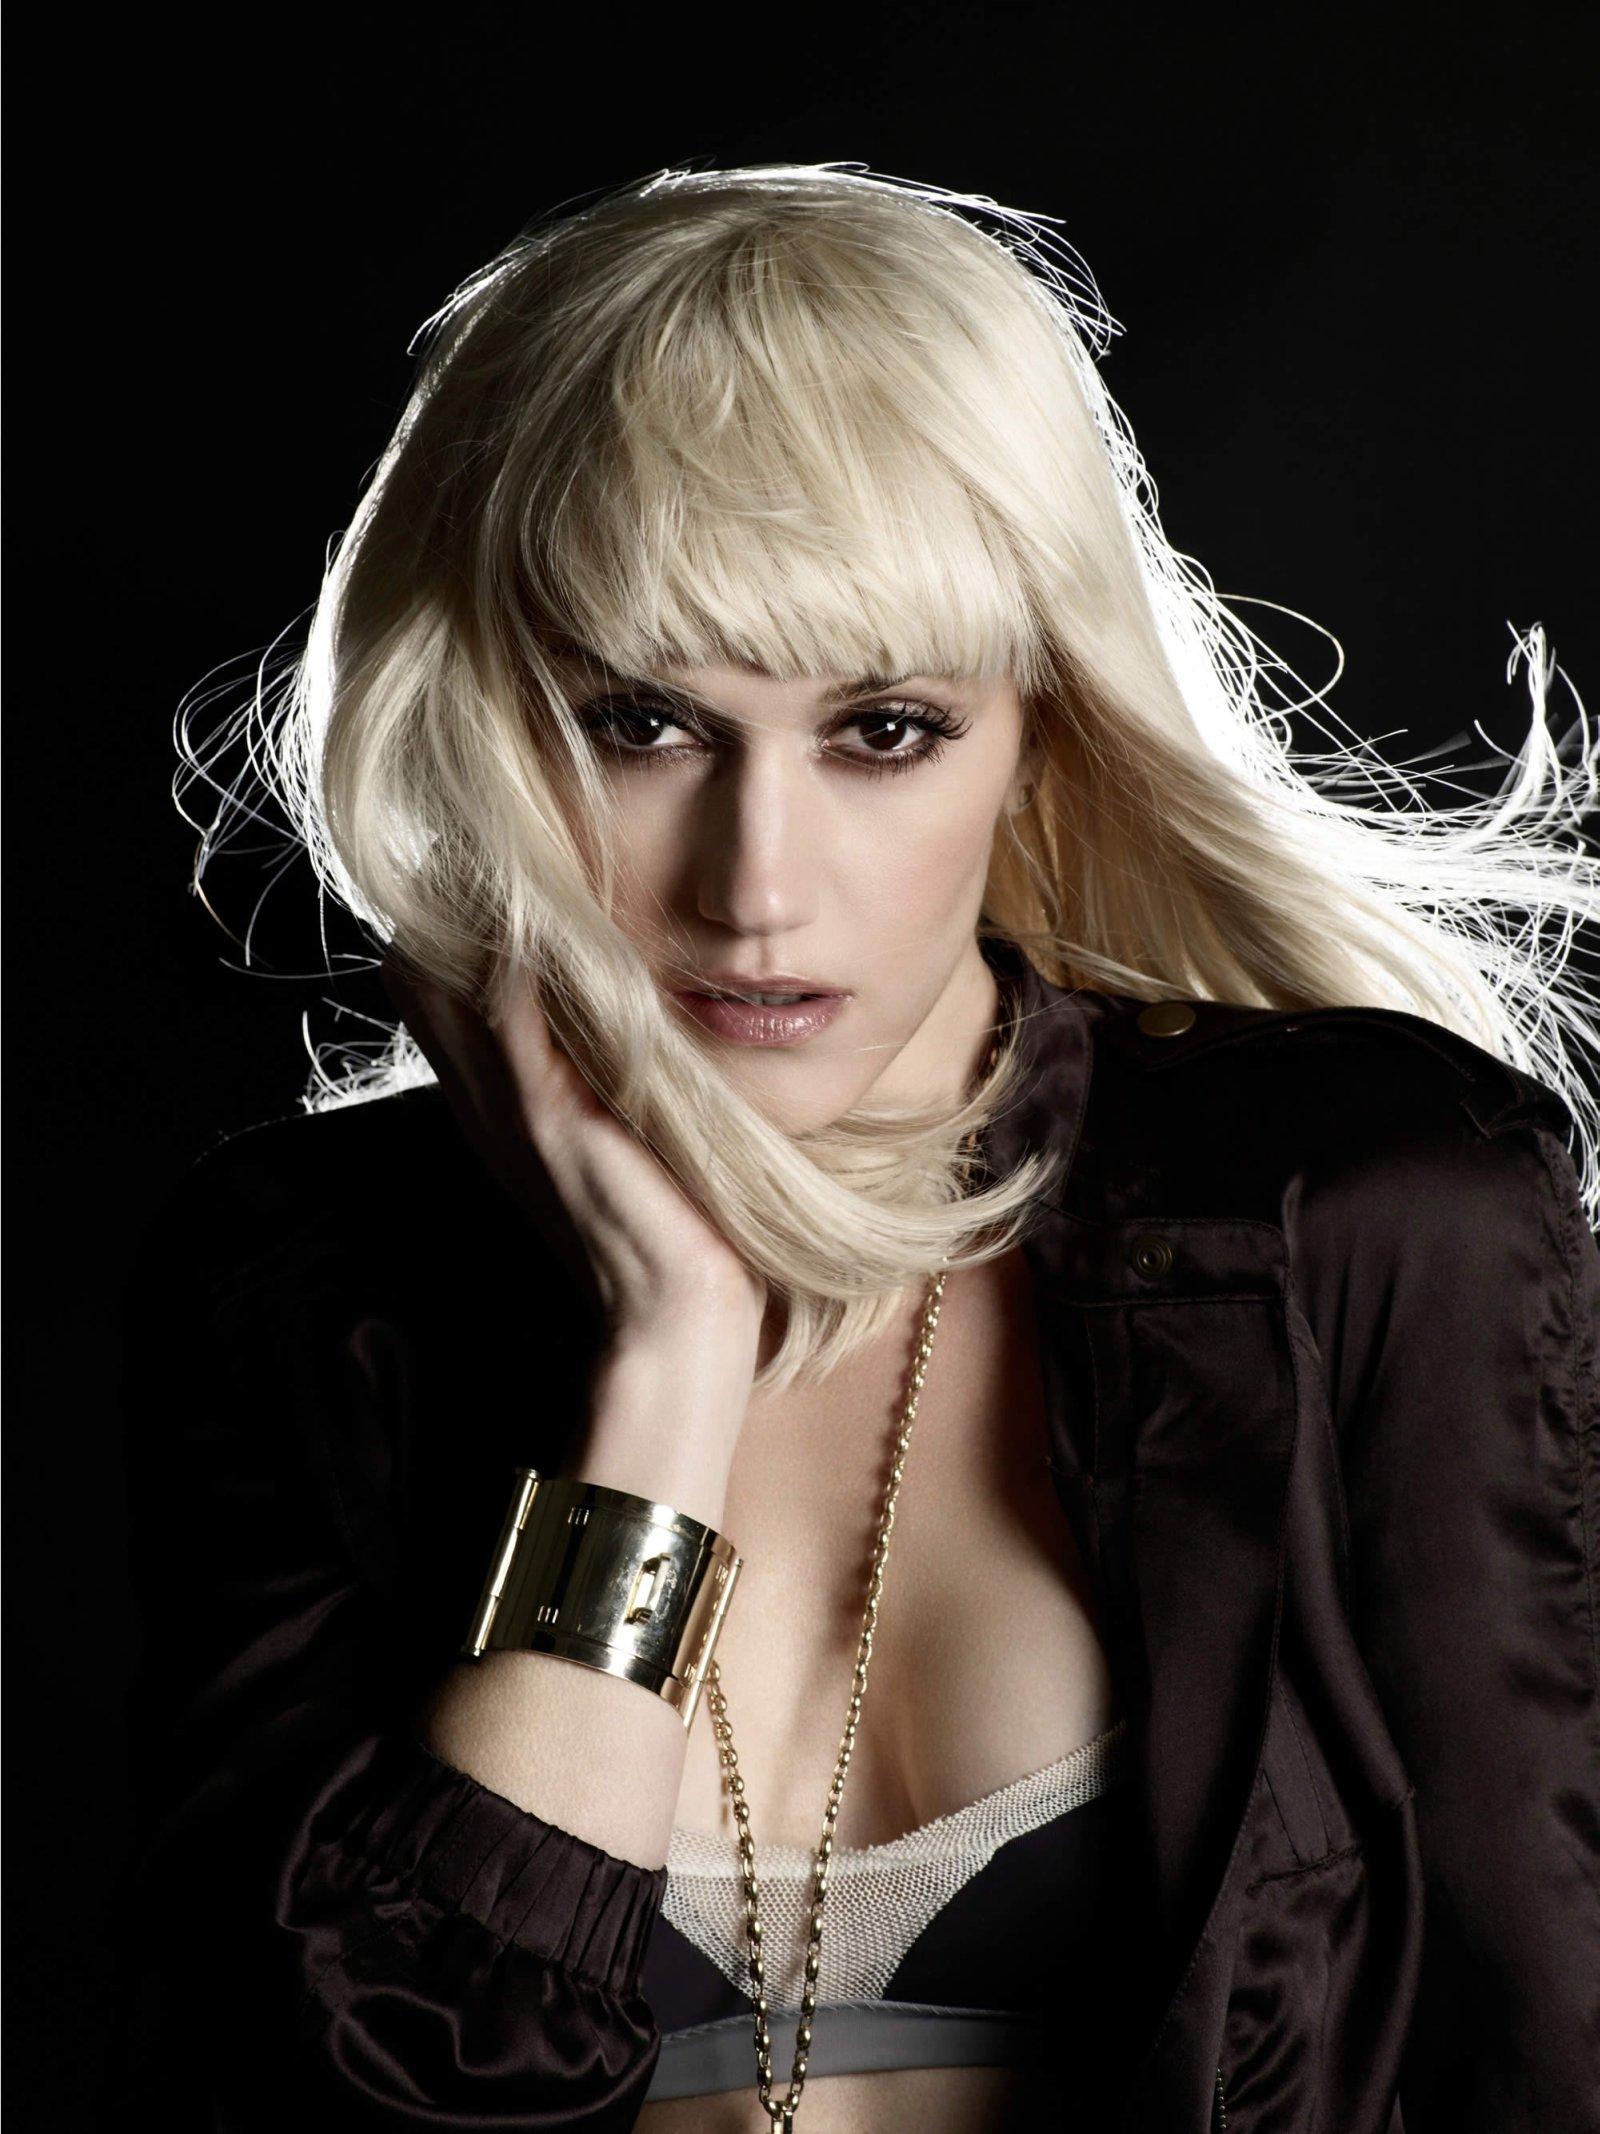 GwenStefani JasonBell 01 - Gwen Stefani